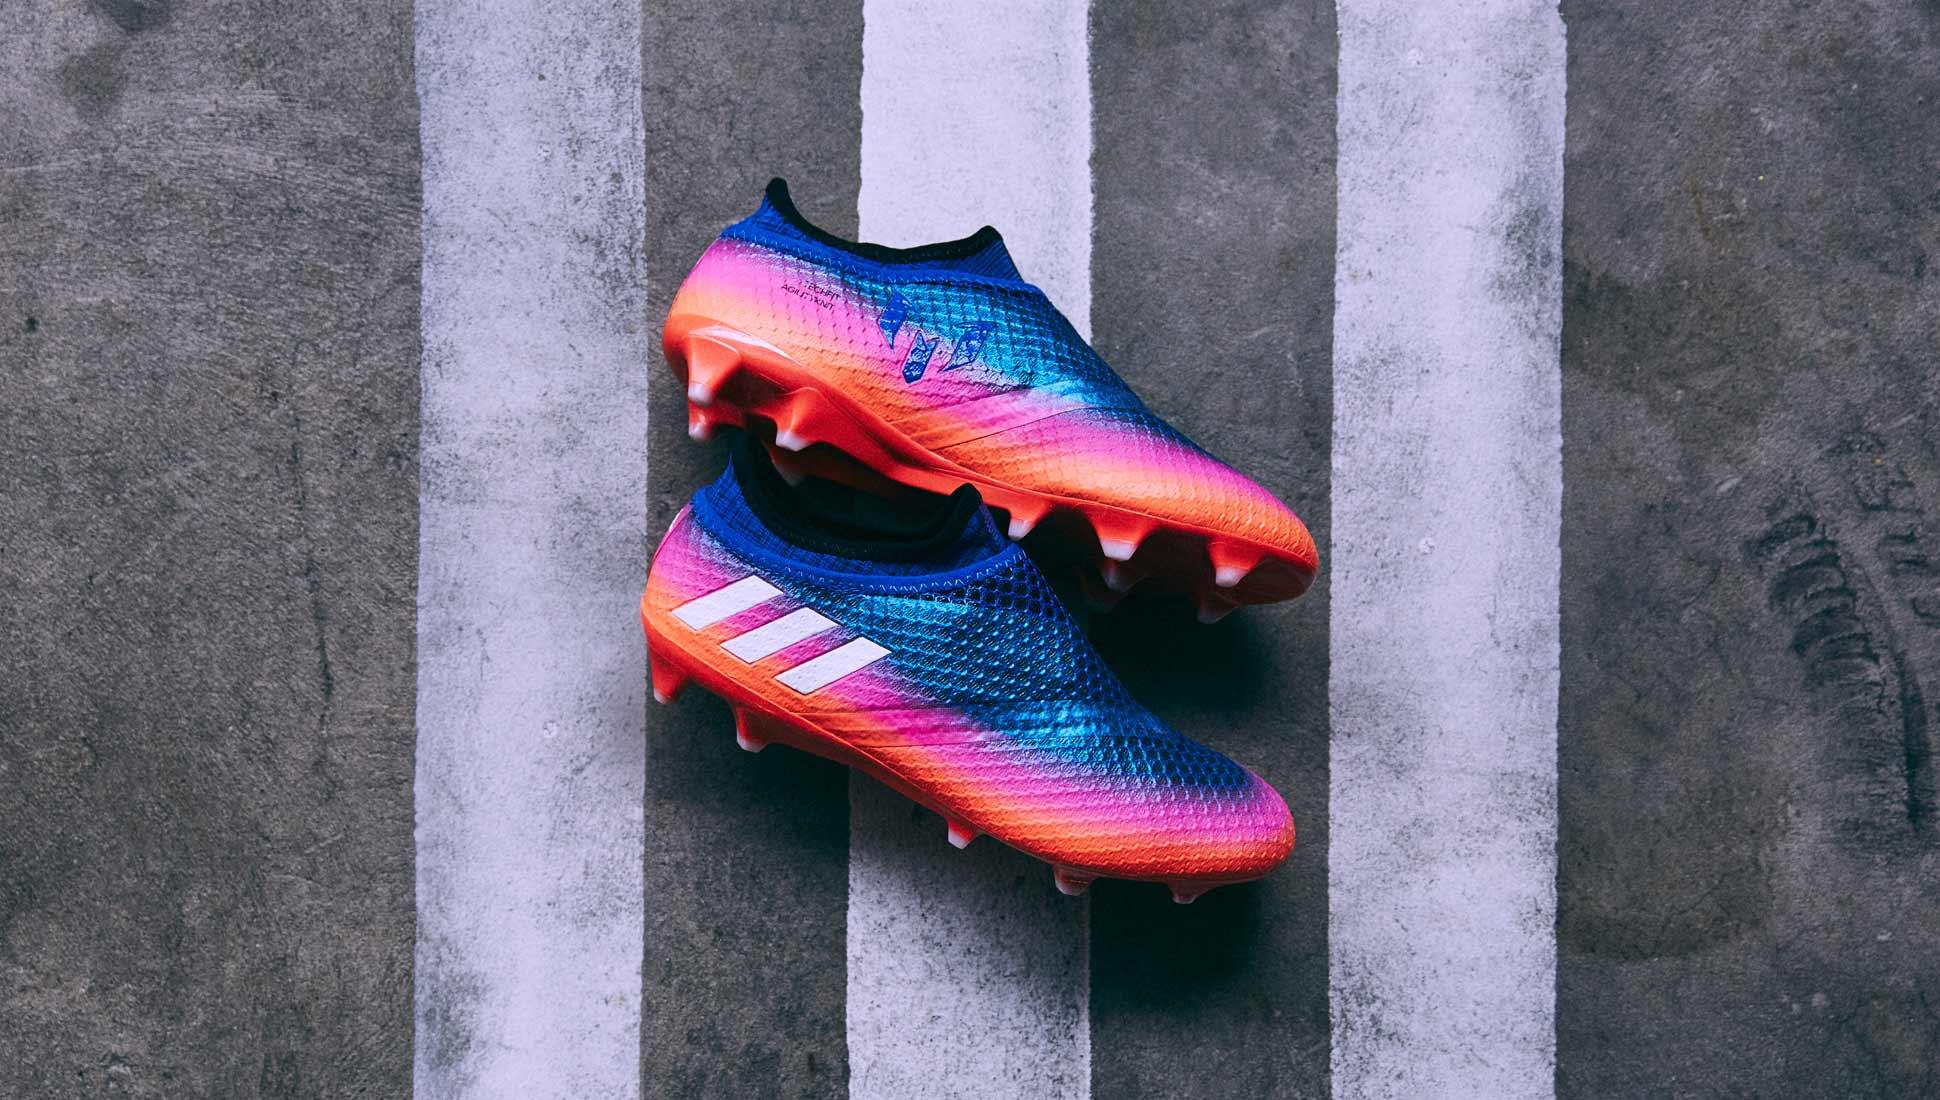 ebe54e8a576 adidas Messi 16+ Pureagility Football Boots - SoccerBible.